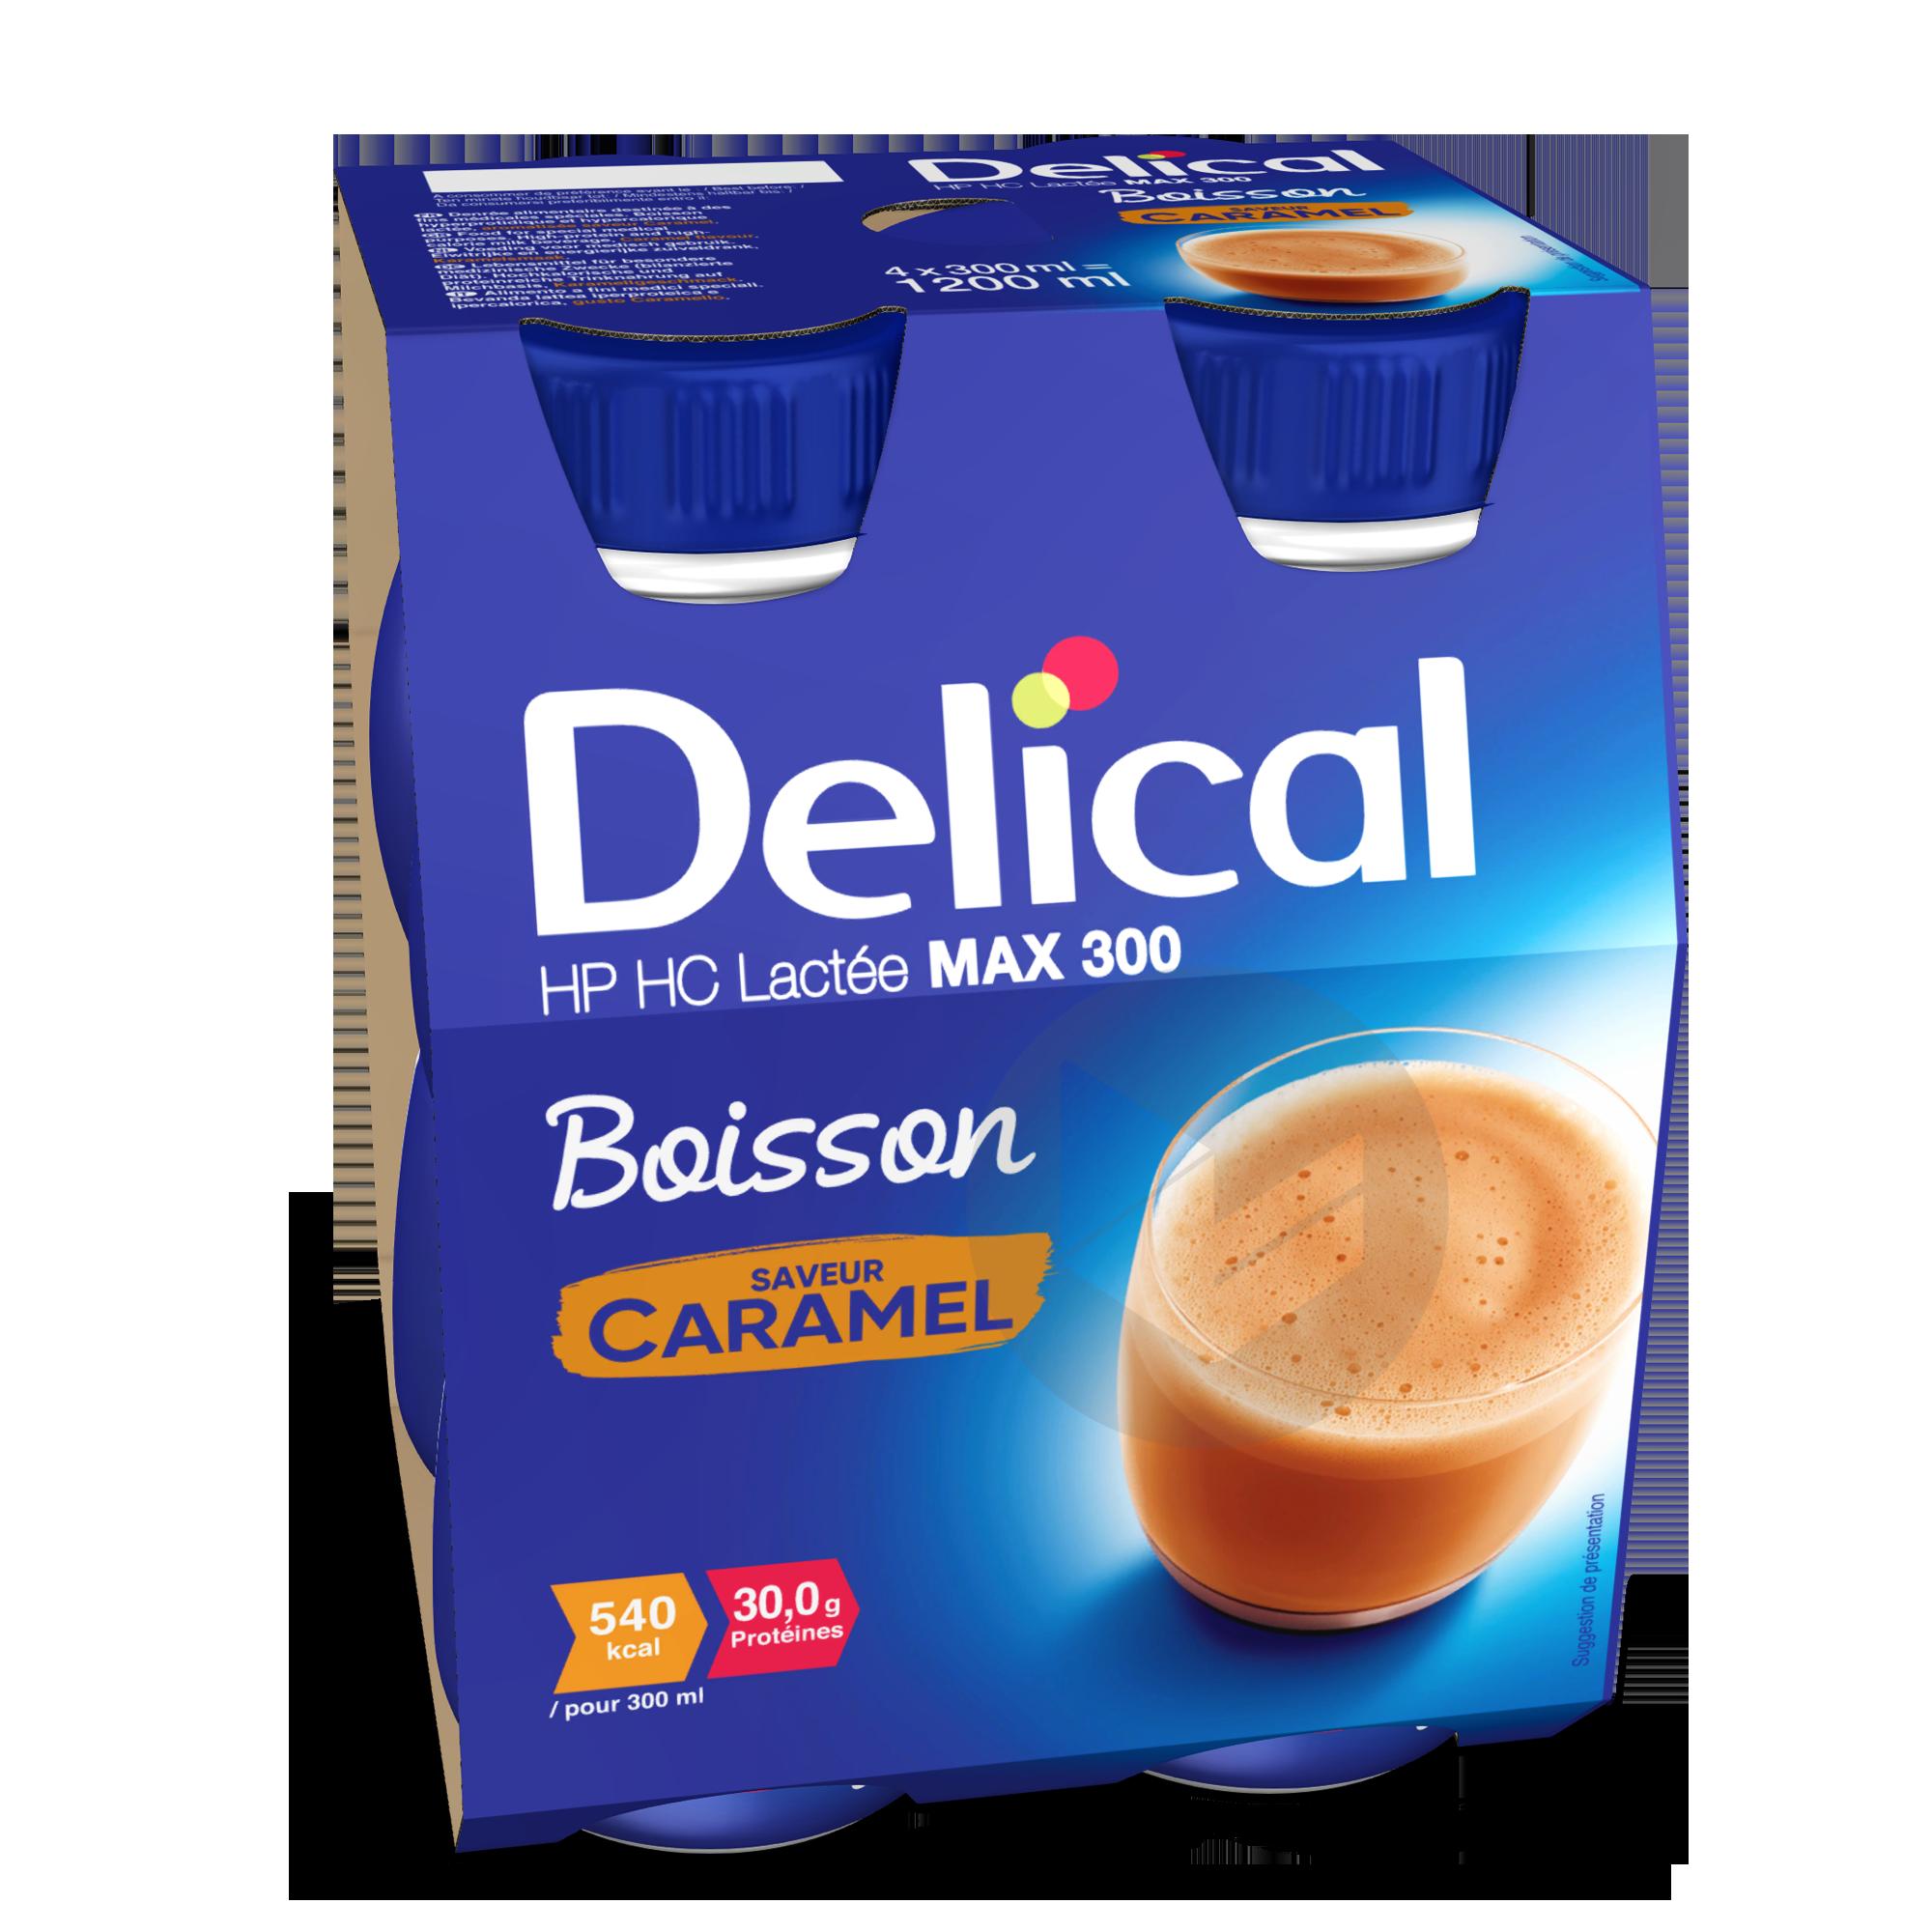 Delical Boisson Hp Hc Max 300 Lactee Caramel